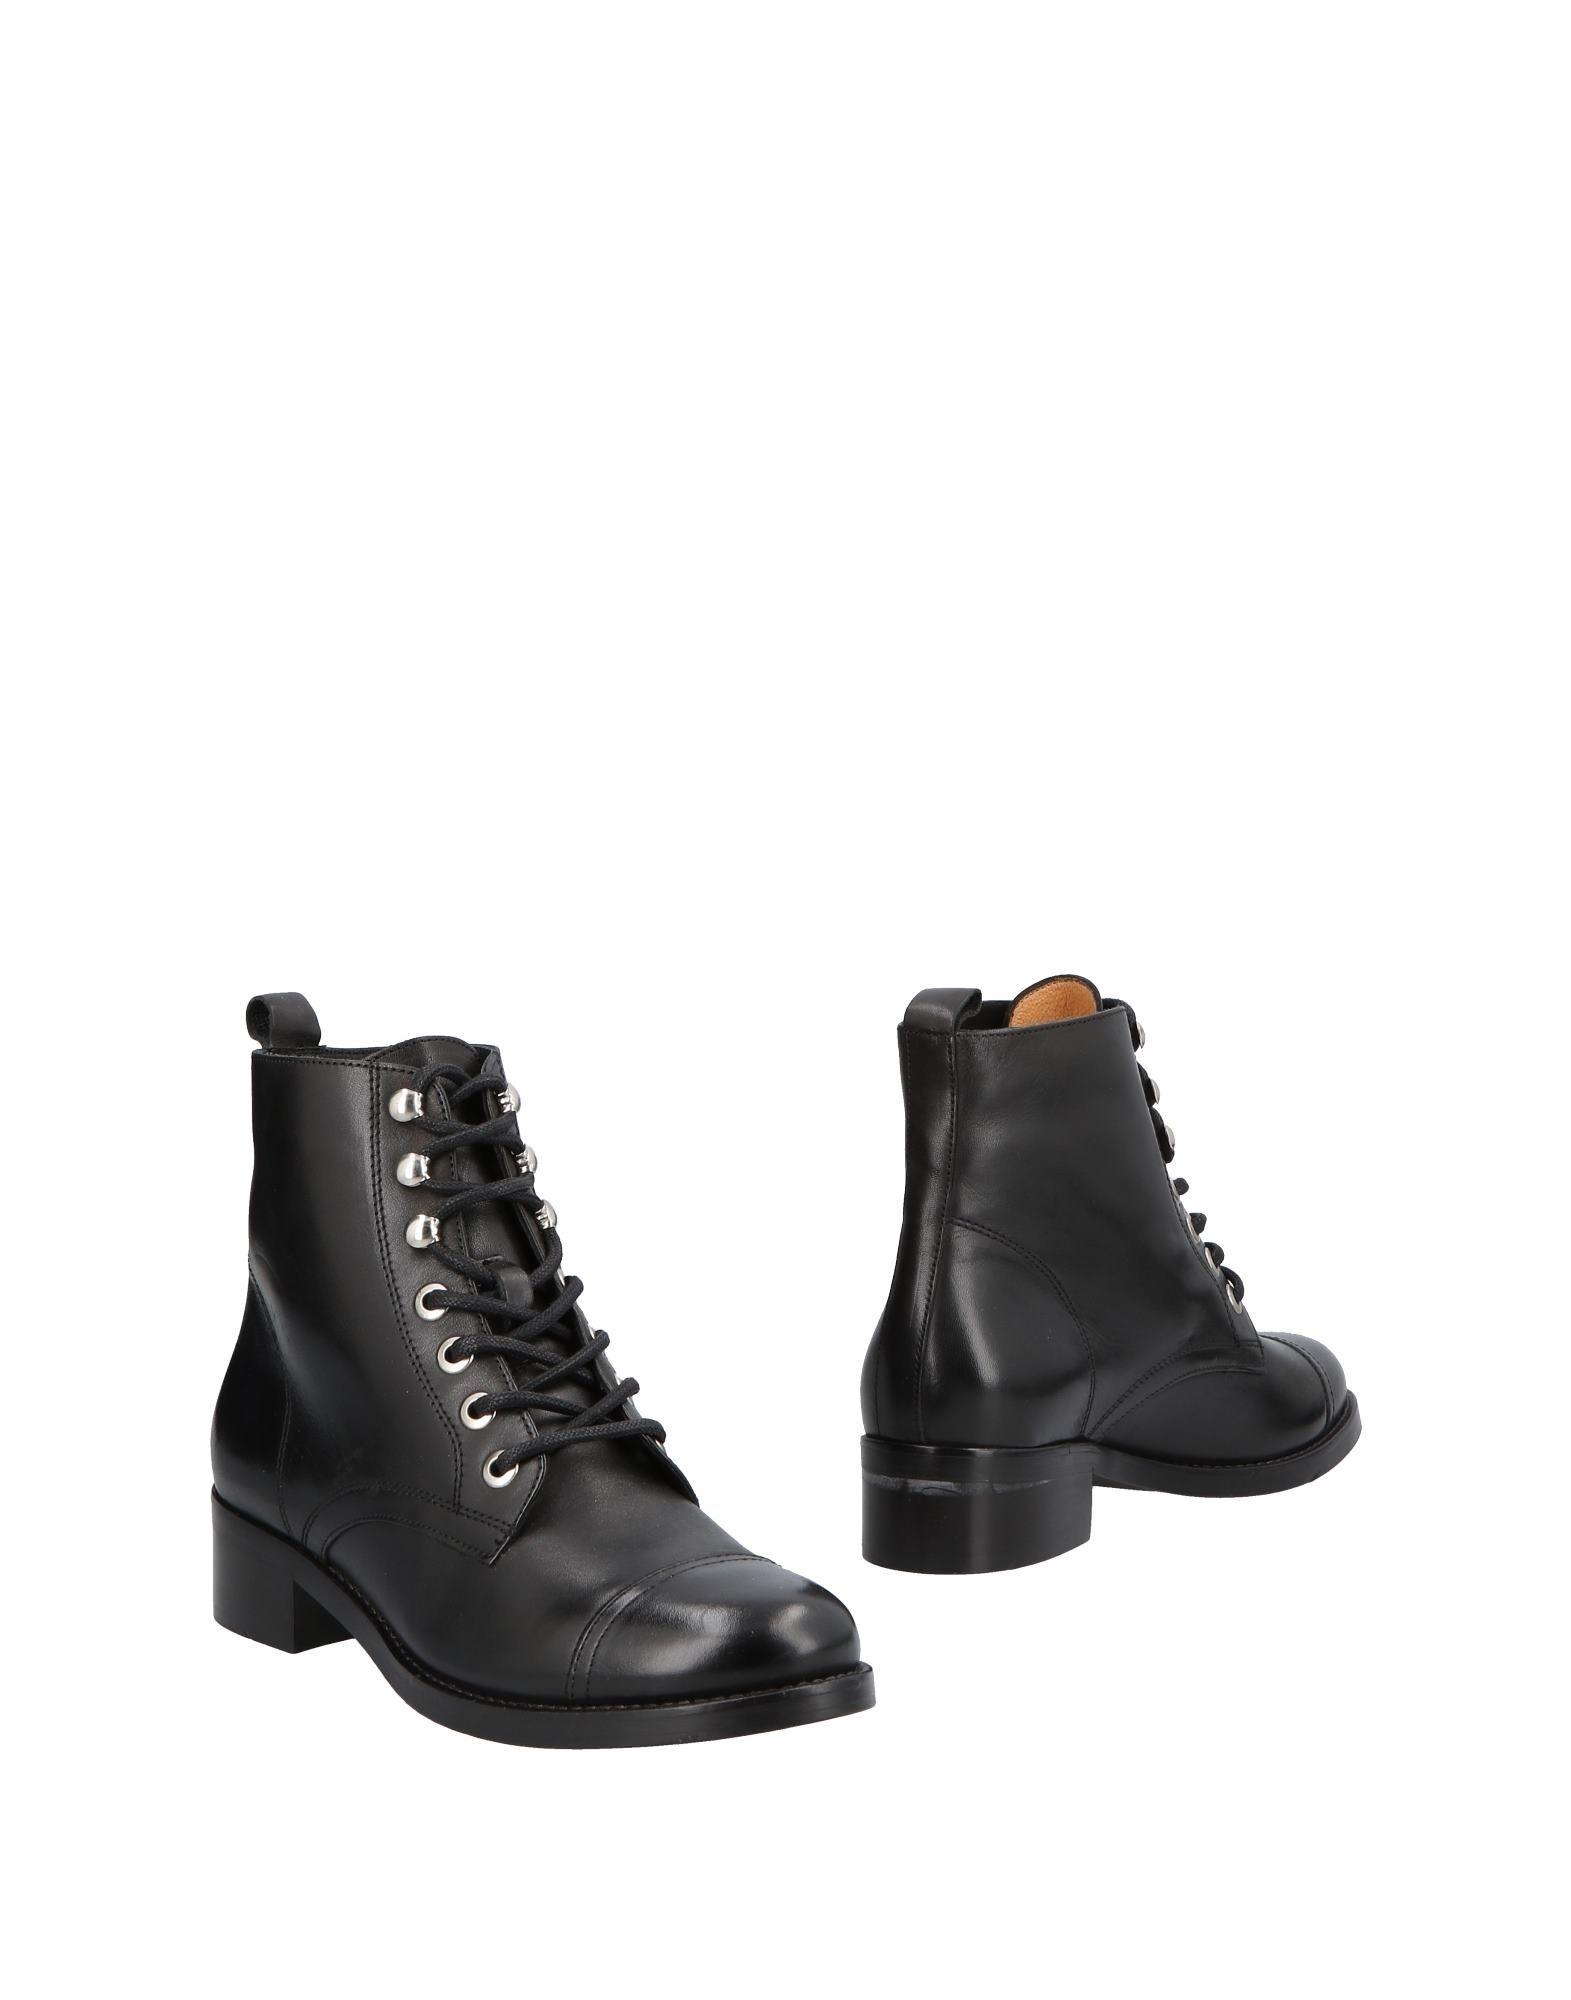 Maje Stiefelette Damen  11480887XOGut aussehende strapazierfähige Schuhe